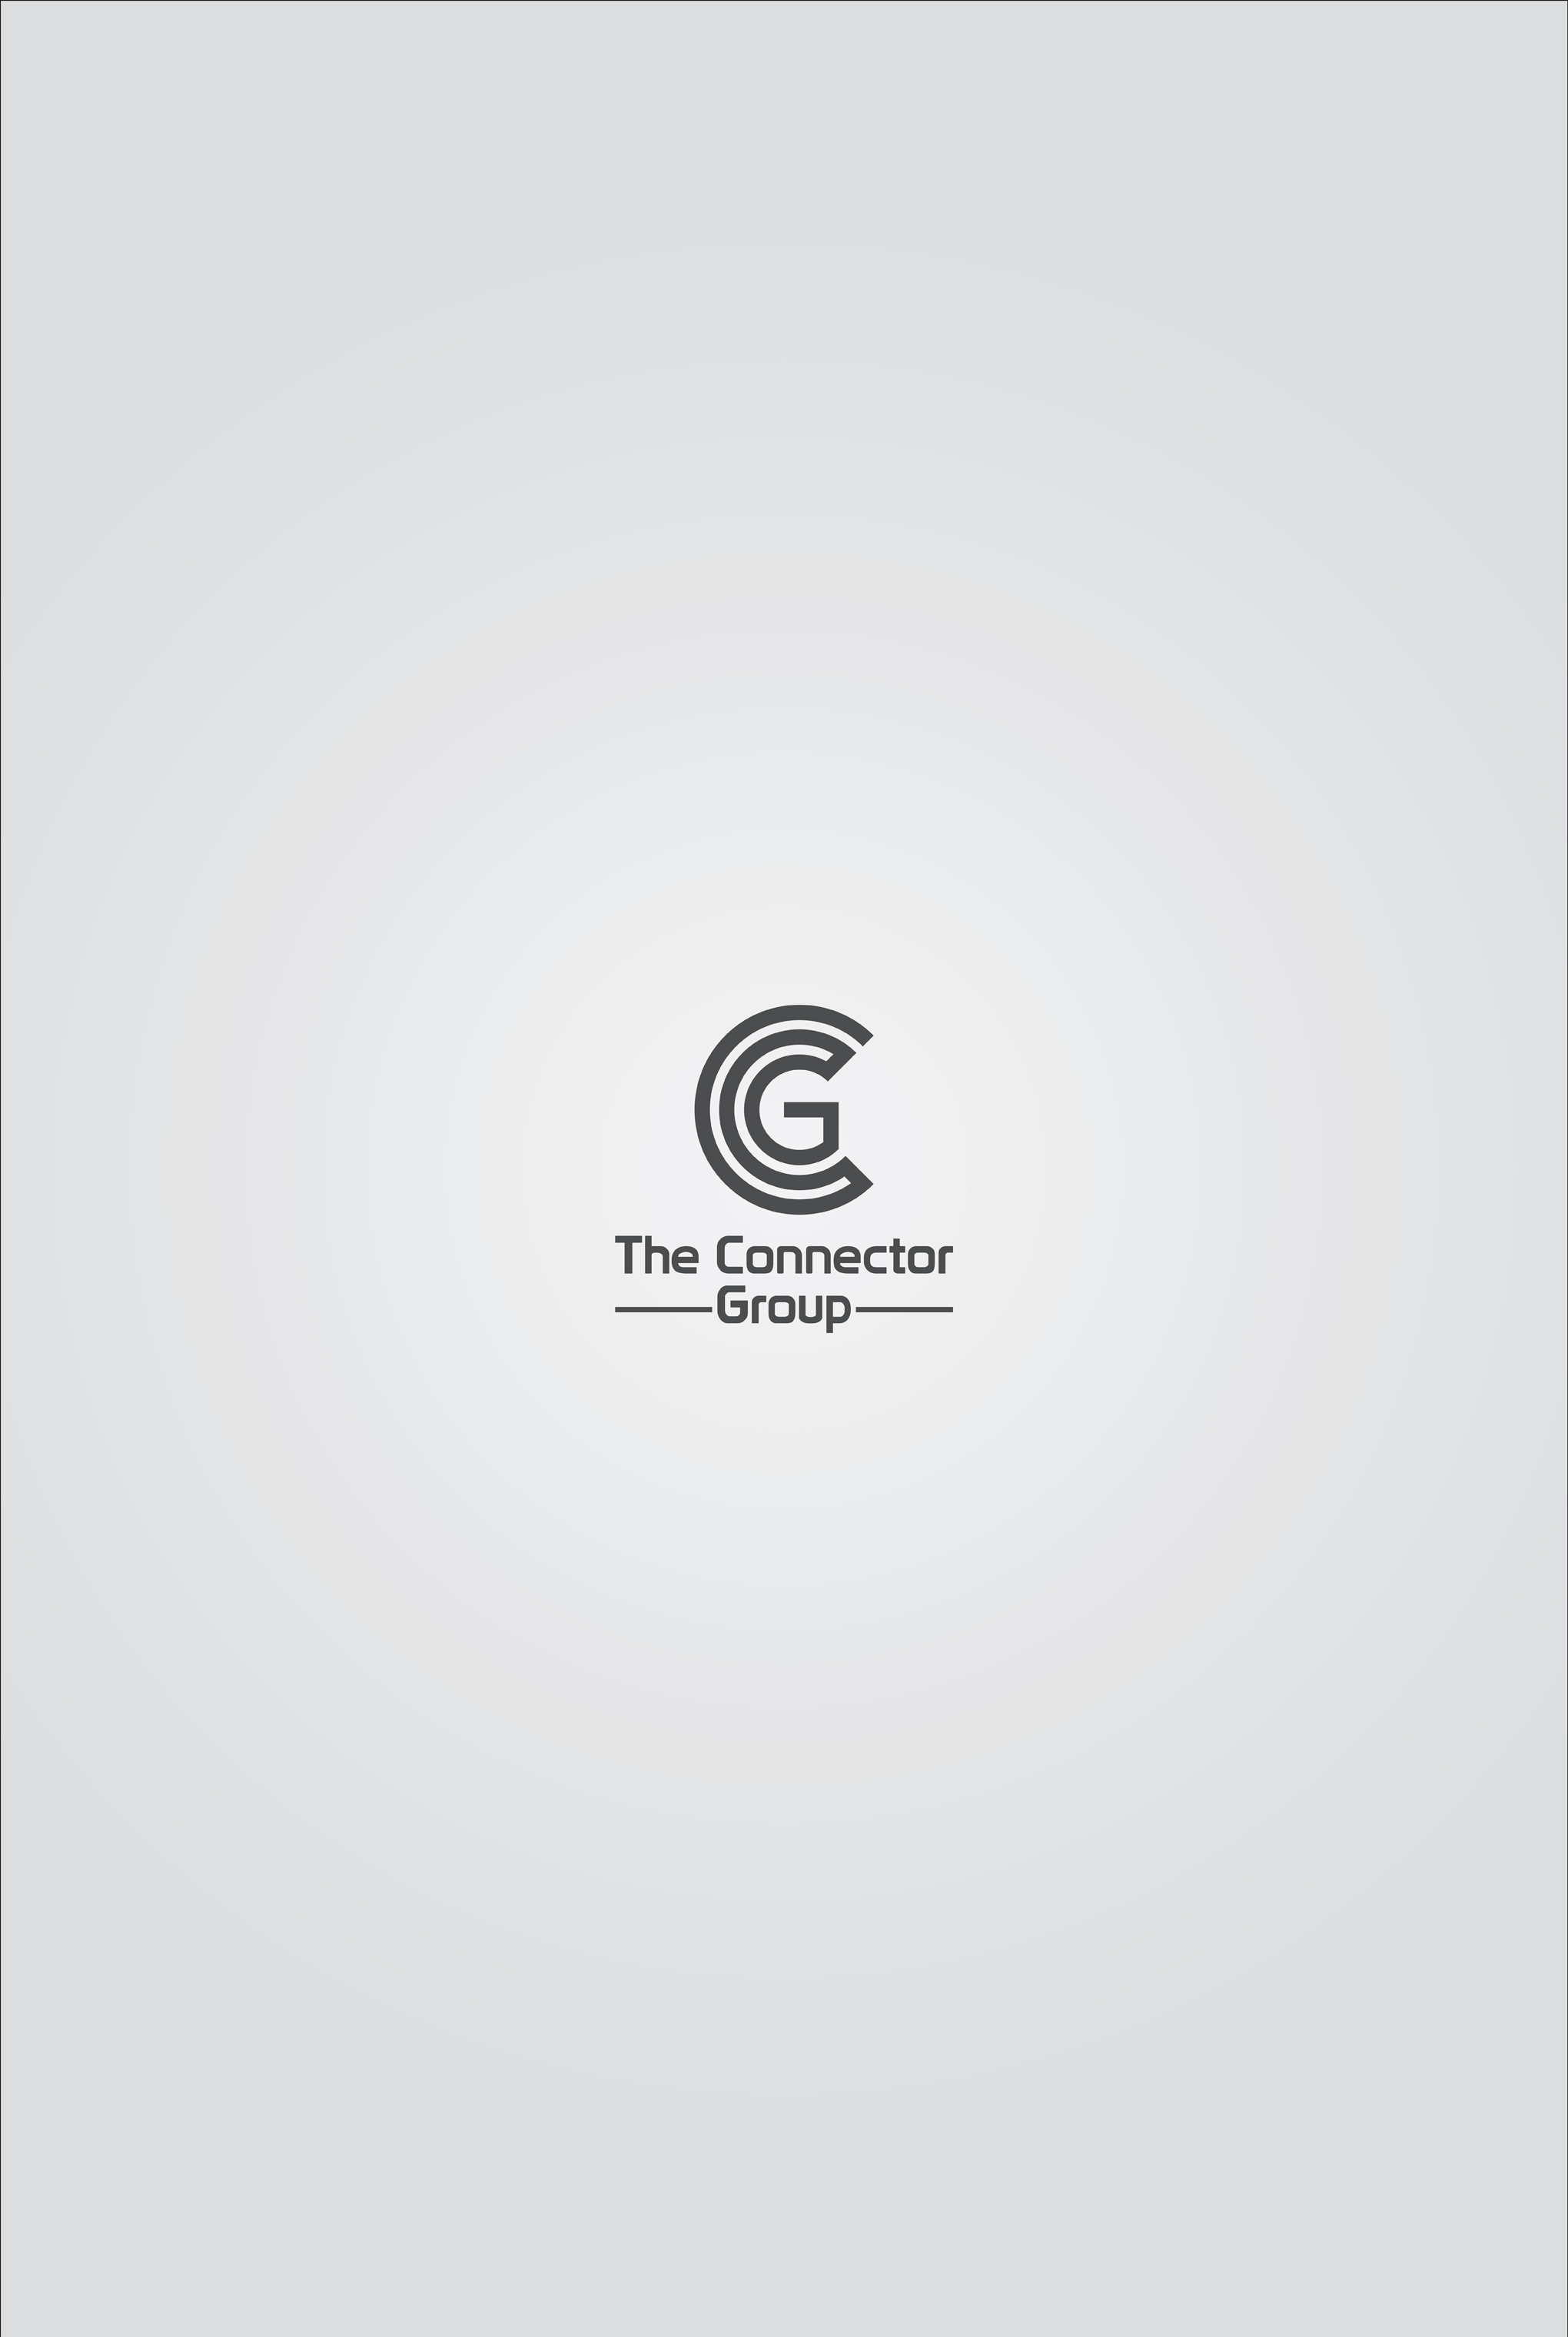 The Connector Group logo. Simple, modern logo, combination